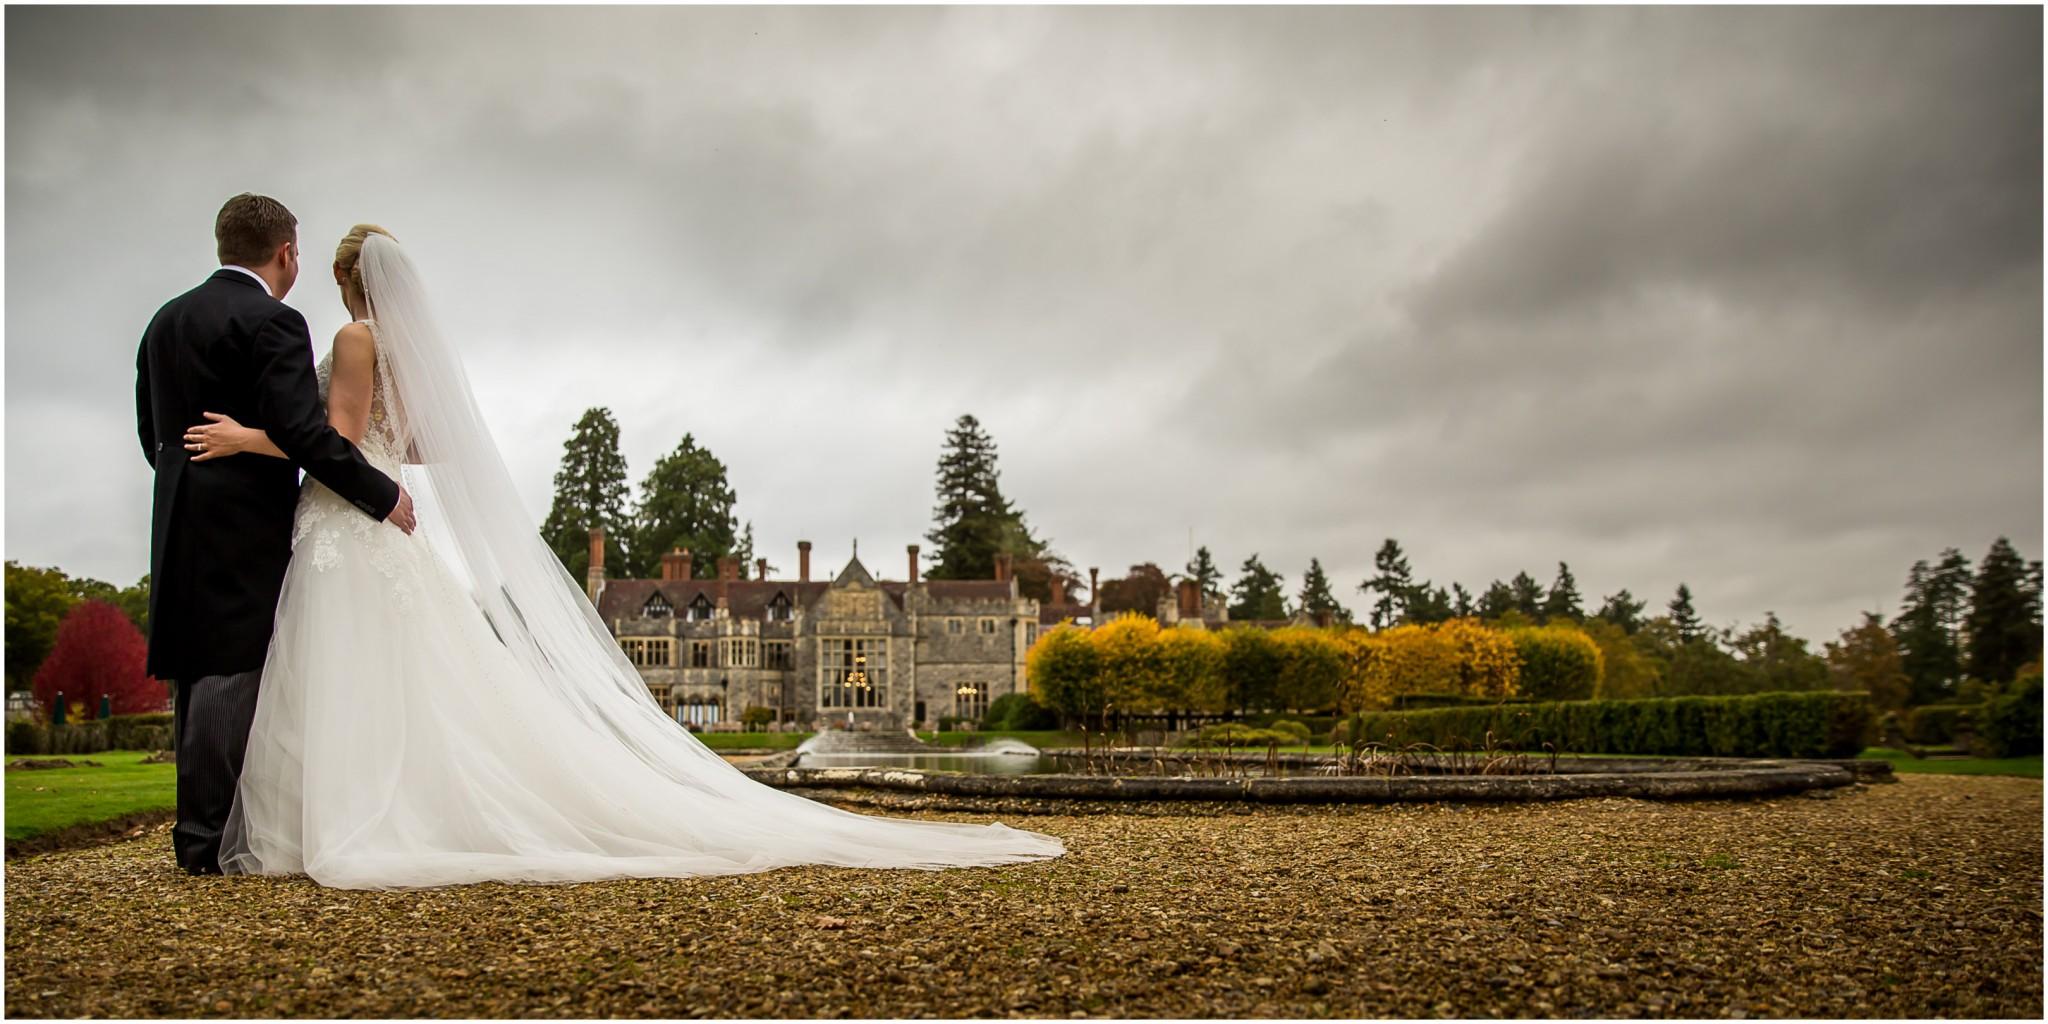 Rhinefield House Wedding Bride & Groom in garden